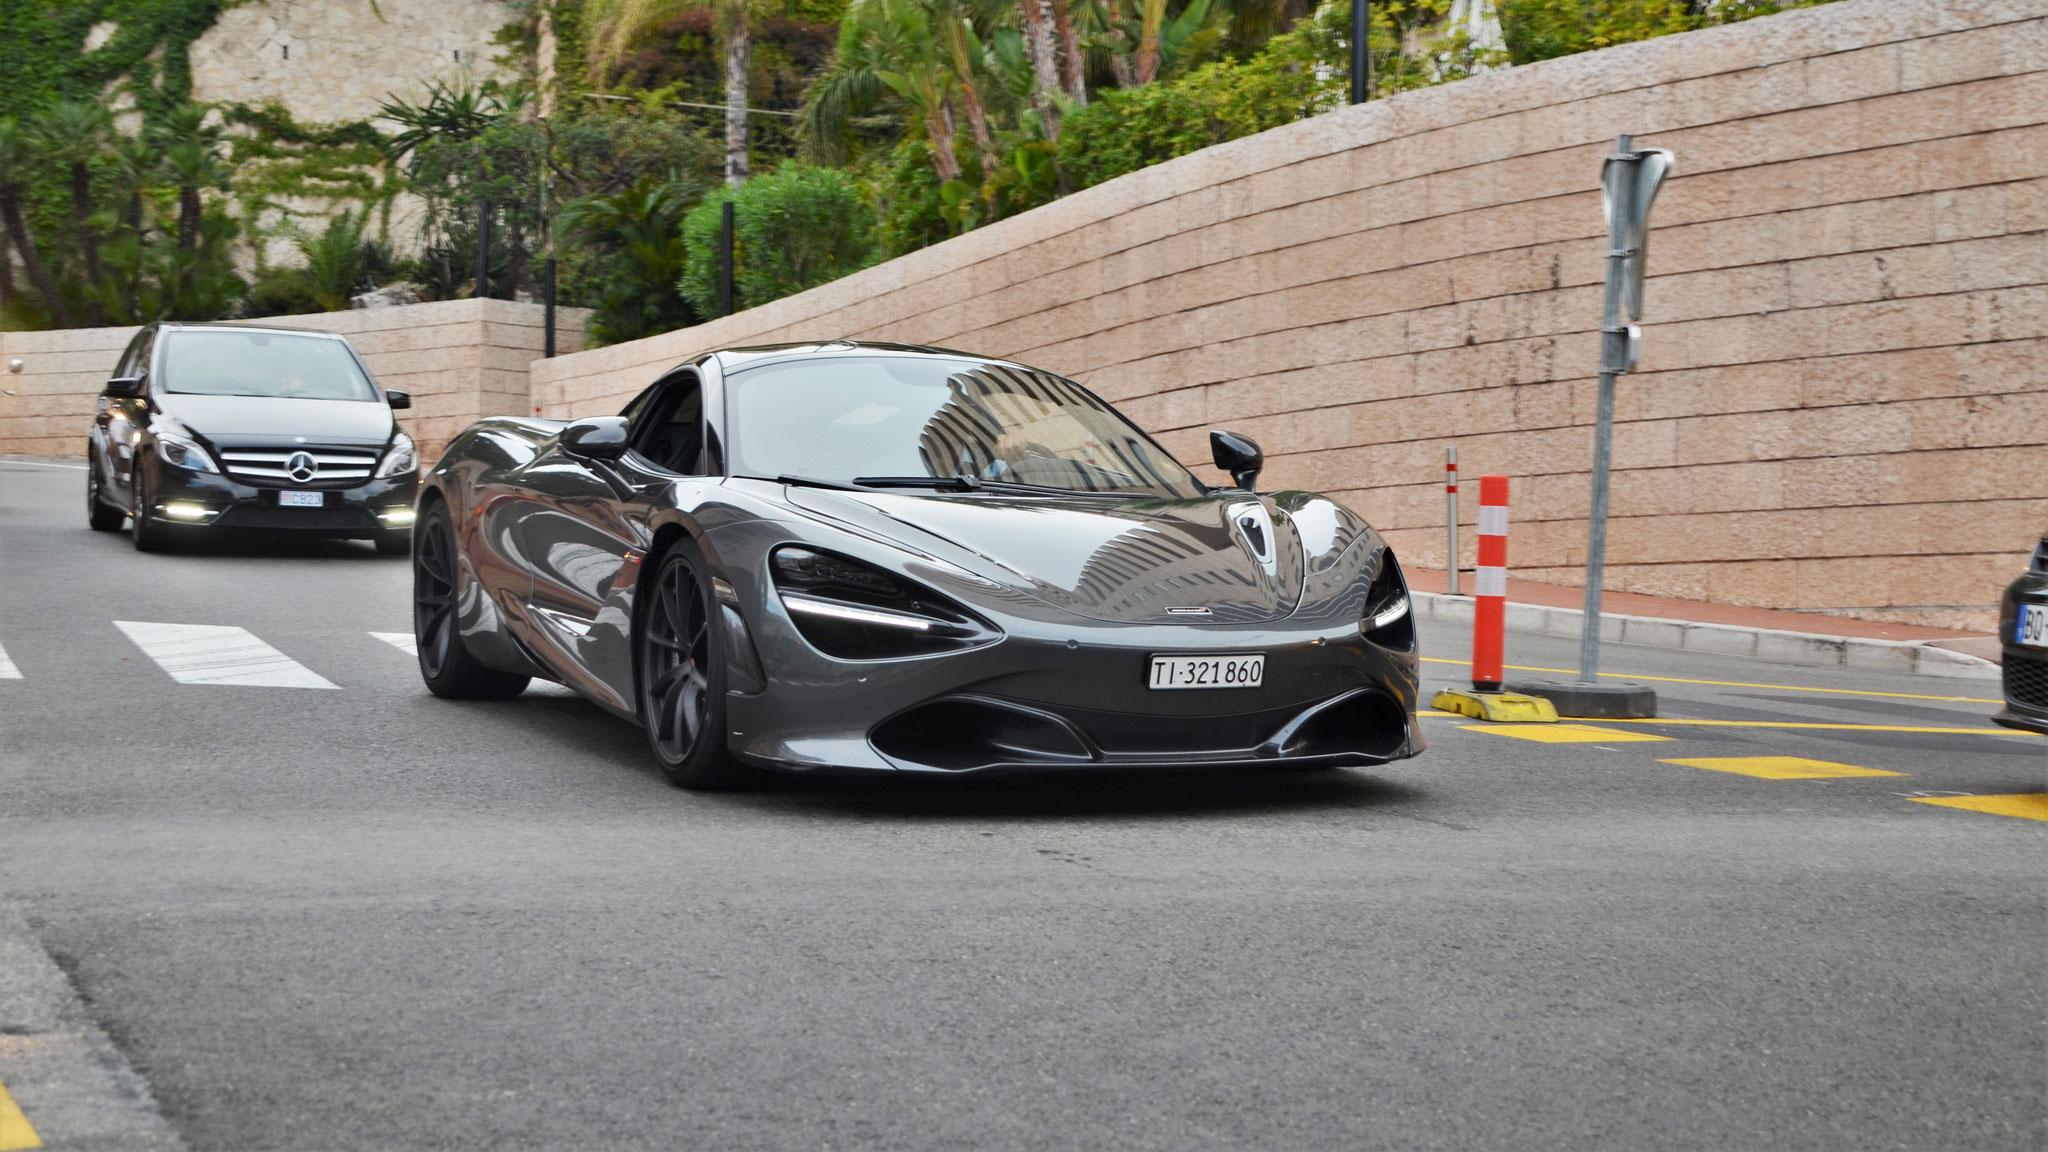 McLaren 720S - TI-321860 (CH)